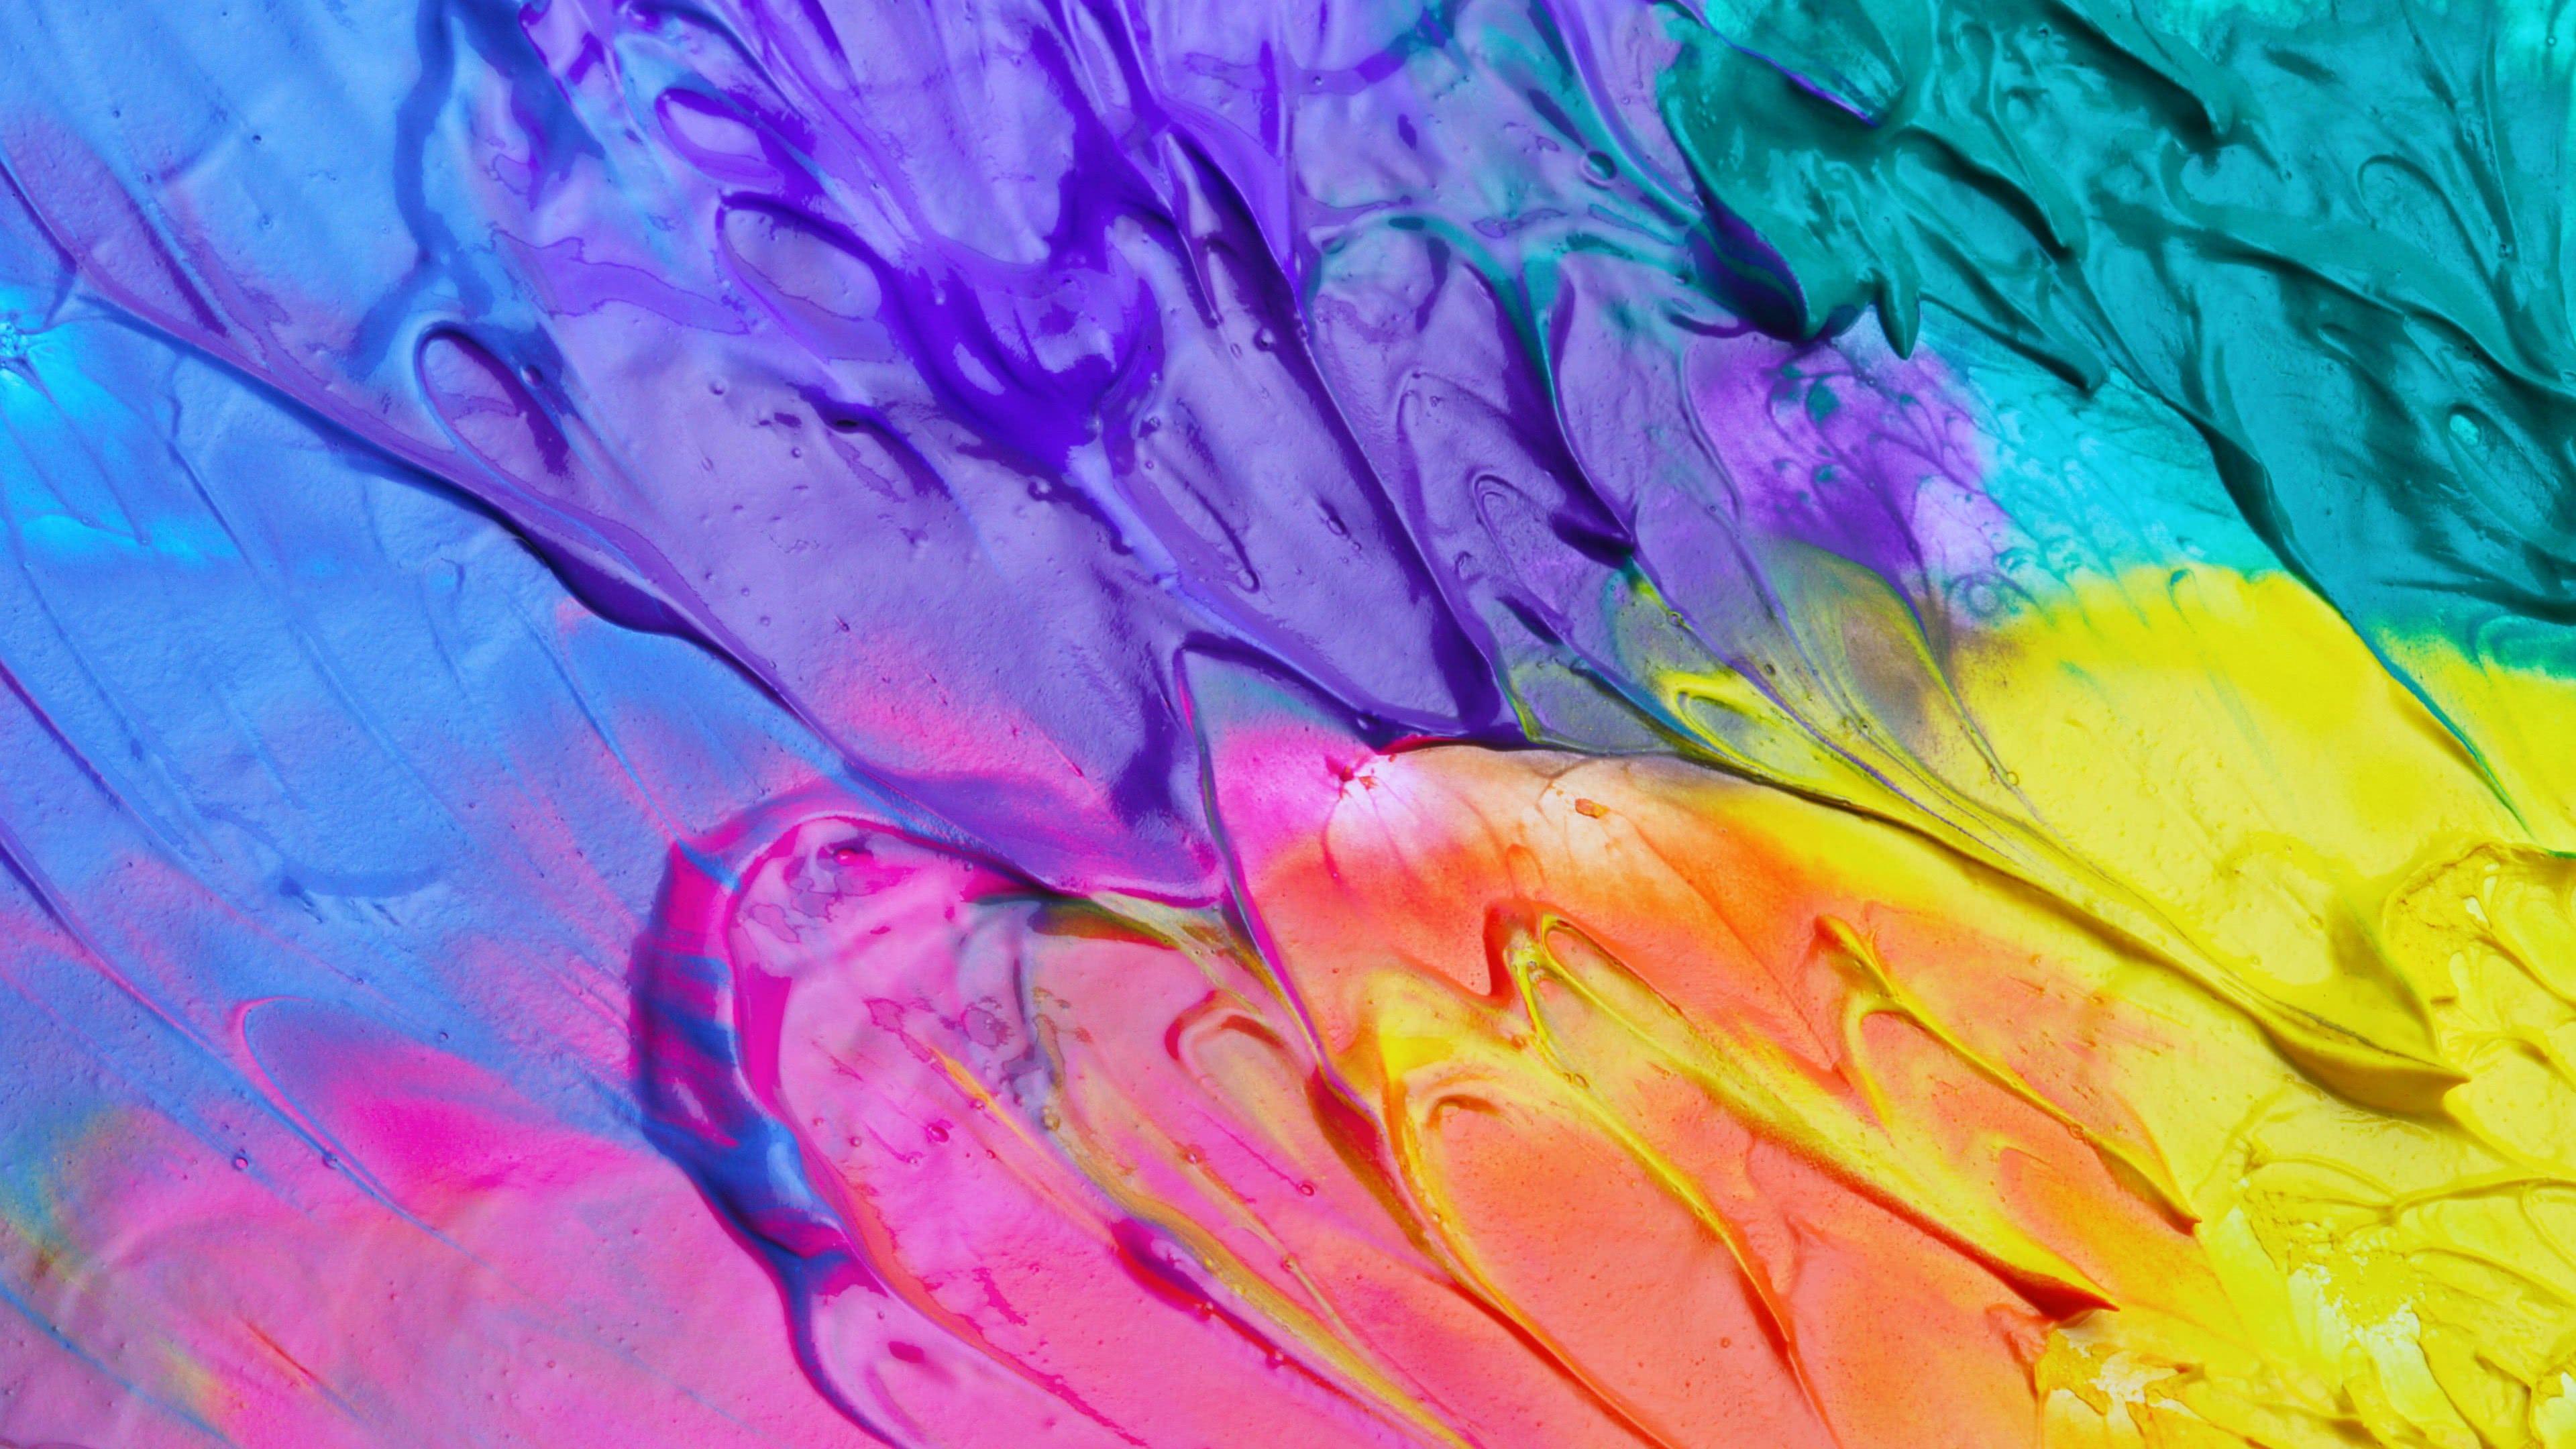 oil paint mixture uhd 4k wallpaper